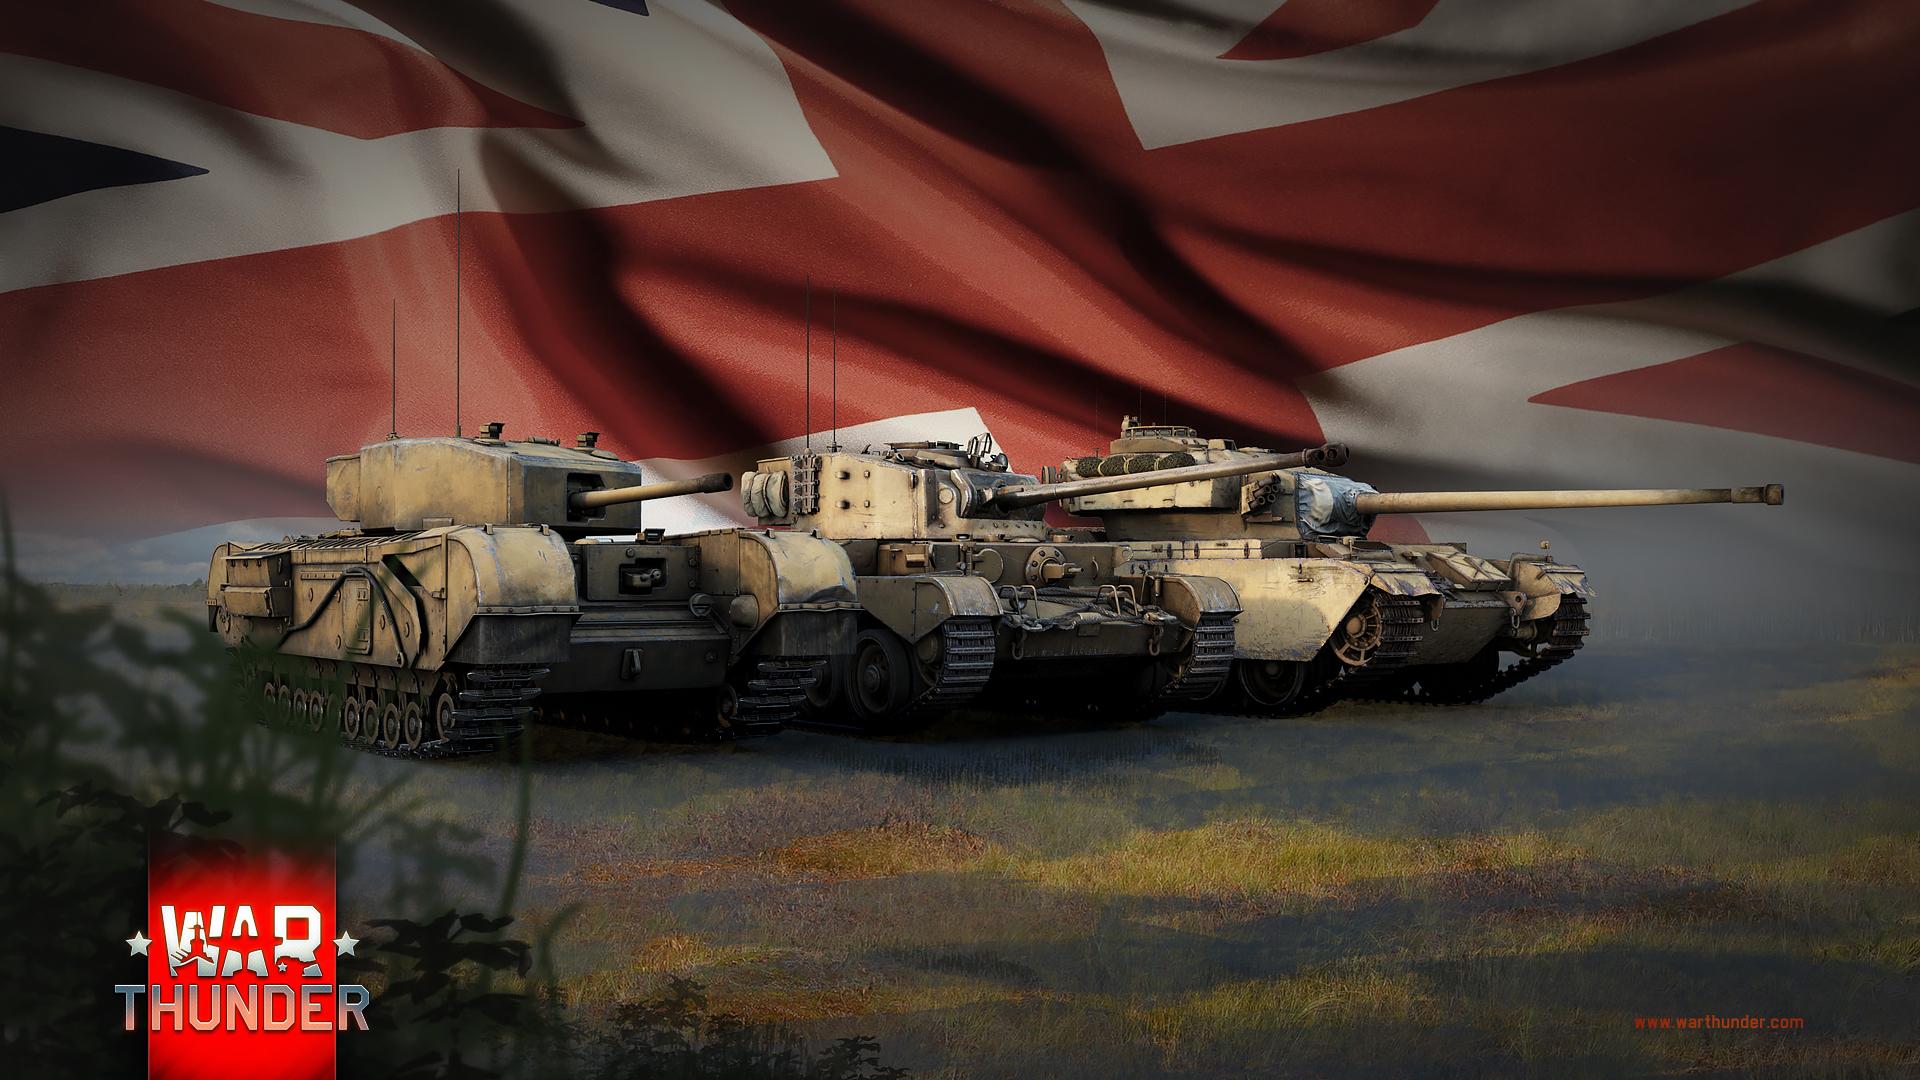 war tank wallpapers - photo #43